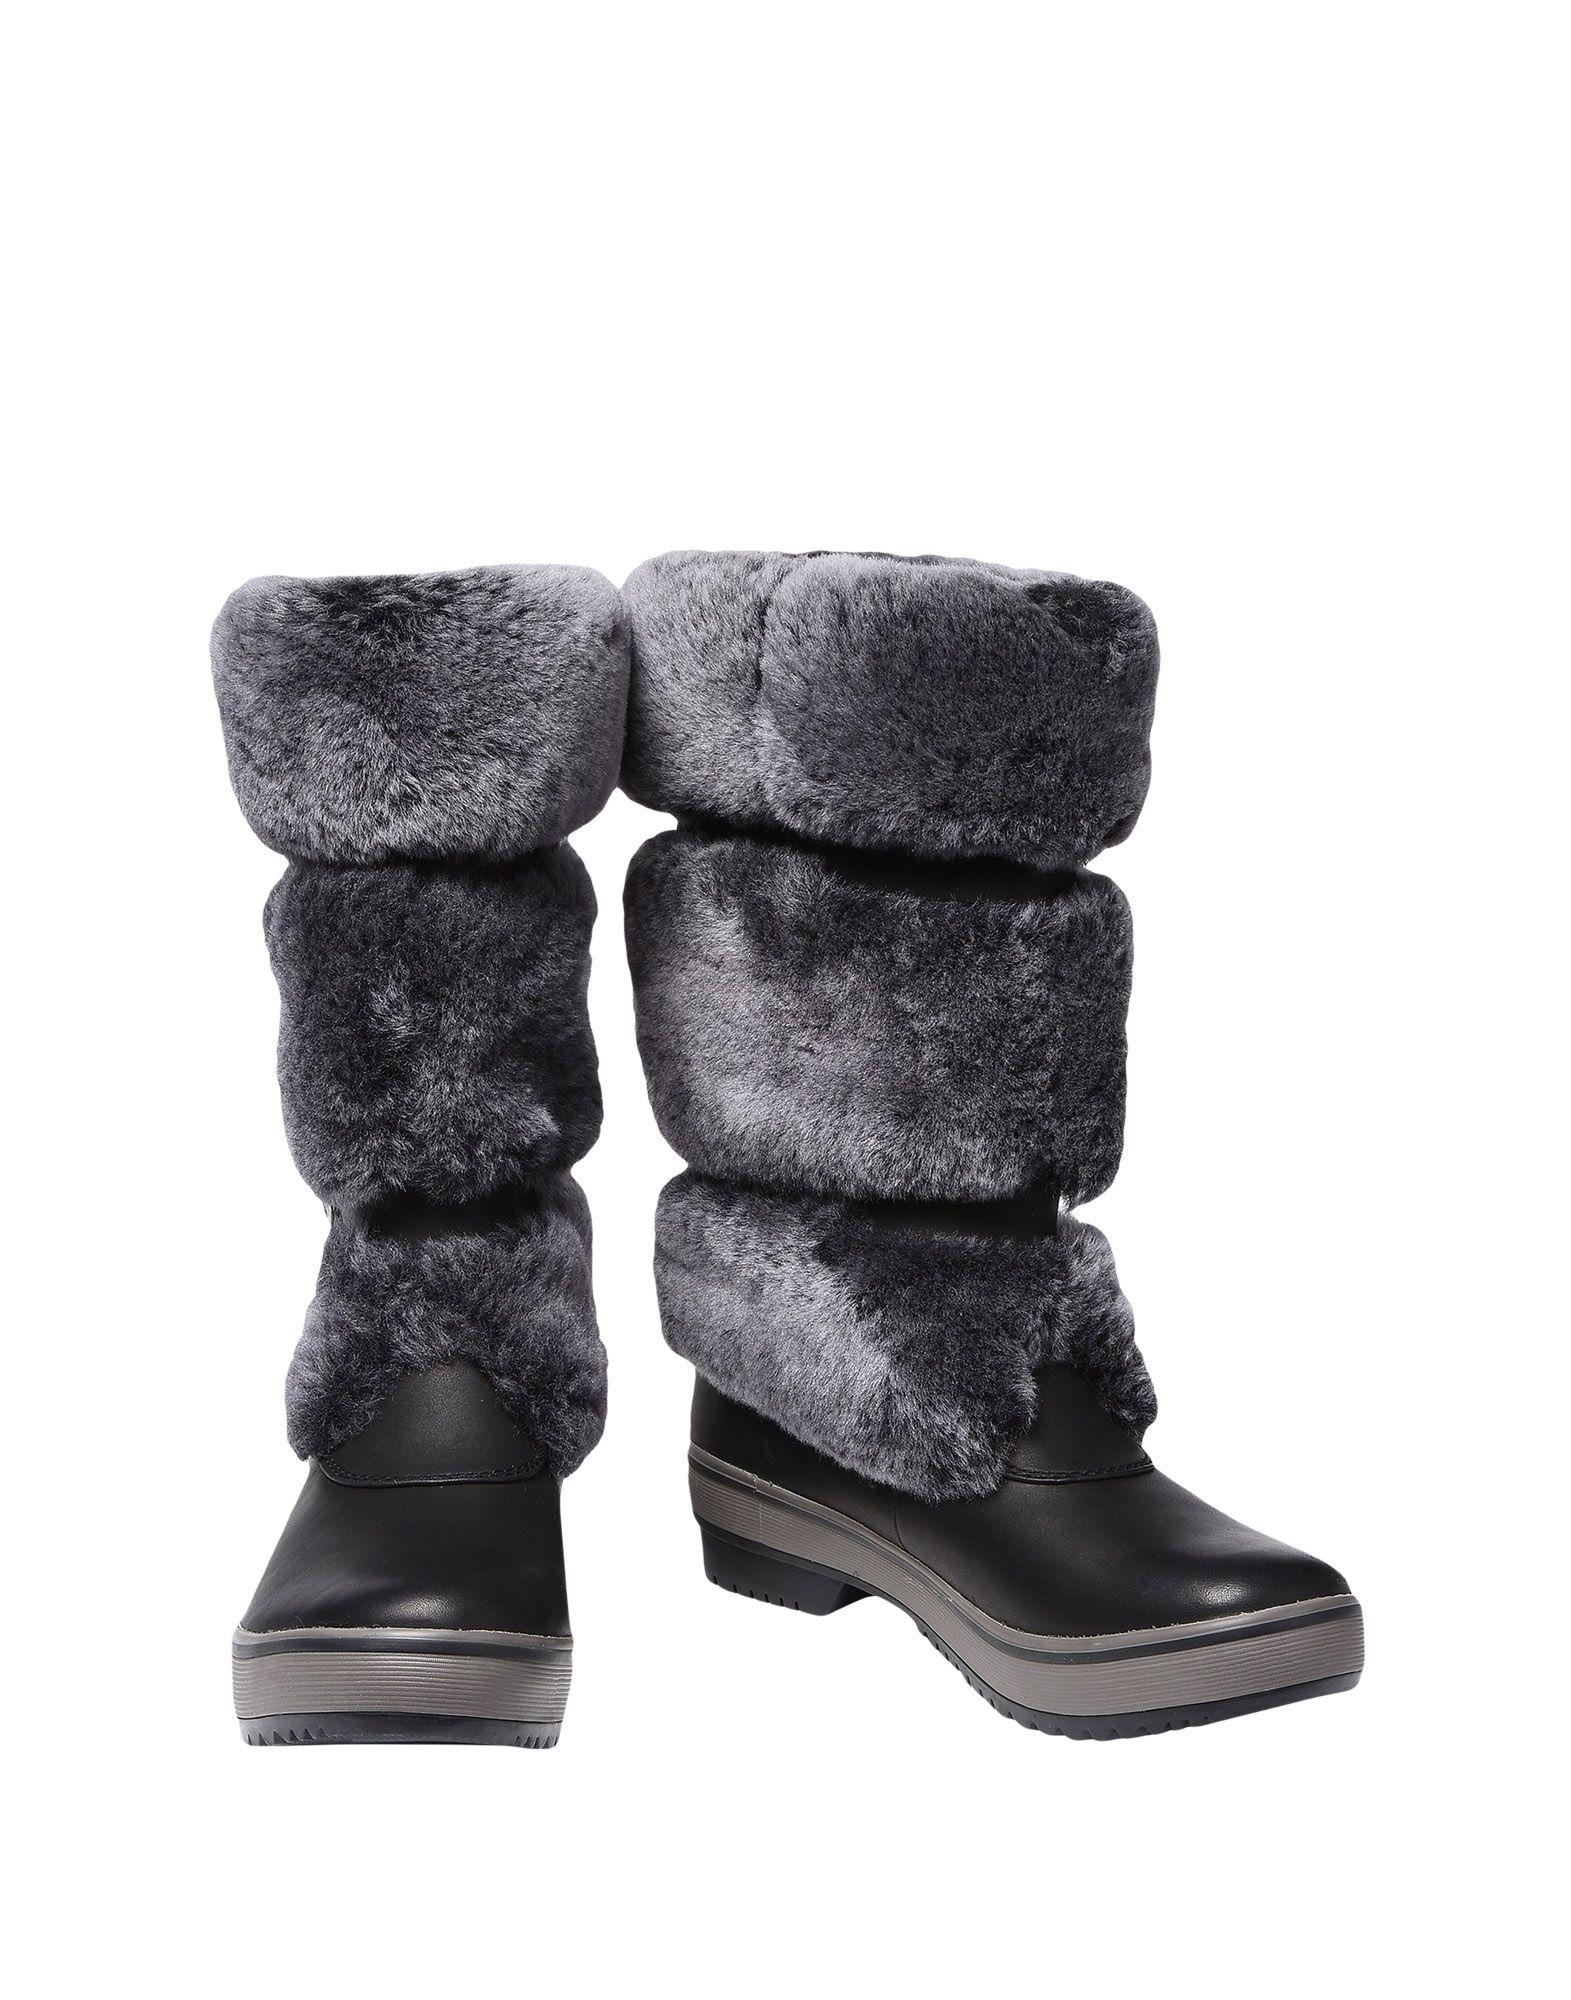 0ec7730dcb5 UGG AUSTRALIA Boots - Footwear | YOOX.COM